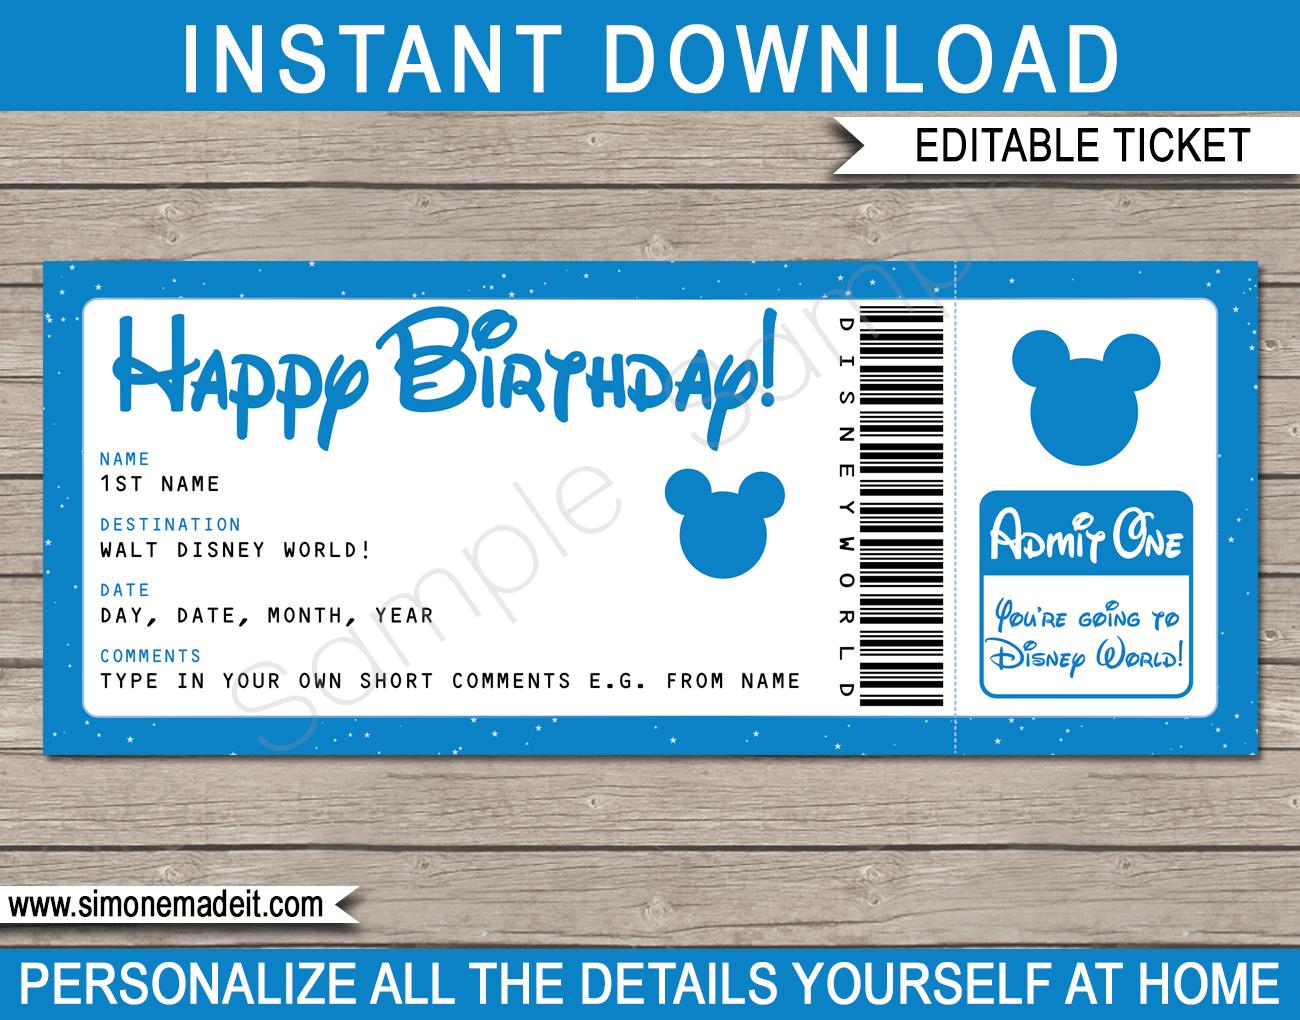 Birthday Surprise Trip To Walt Disney World Ticket Template Disney Trip Reveal Disney Uberraschung Disney Reise Disney World